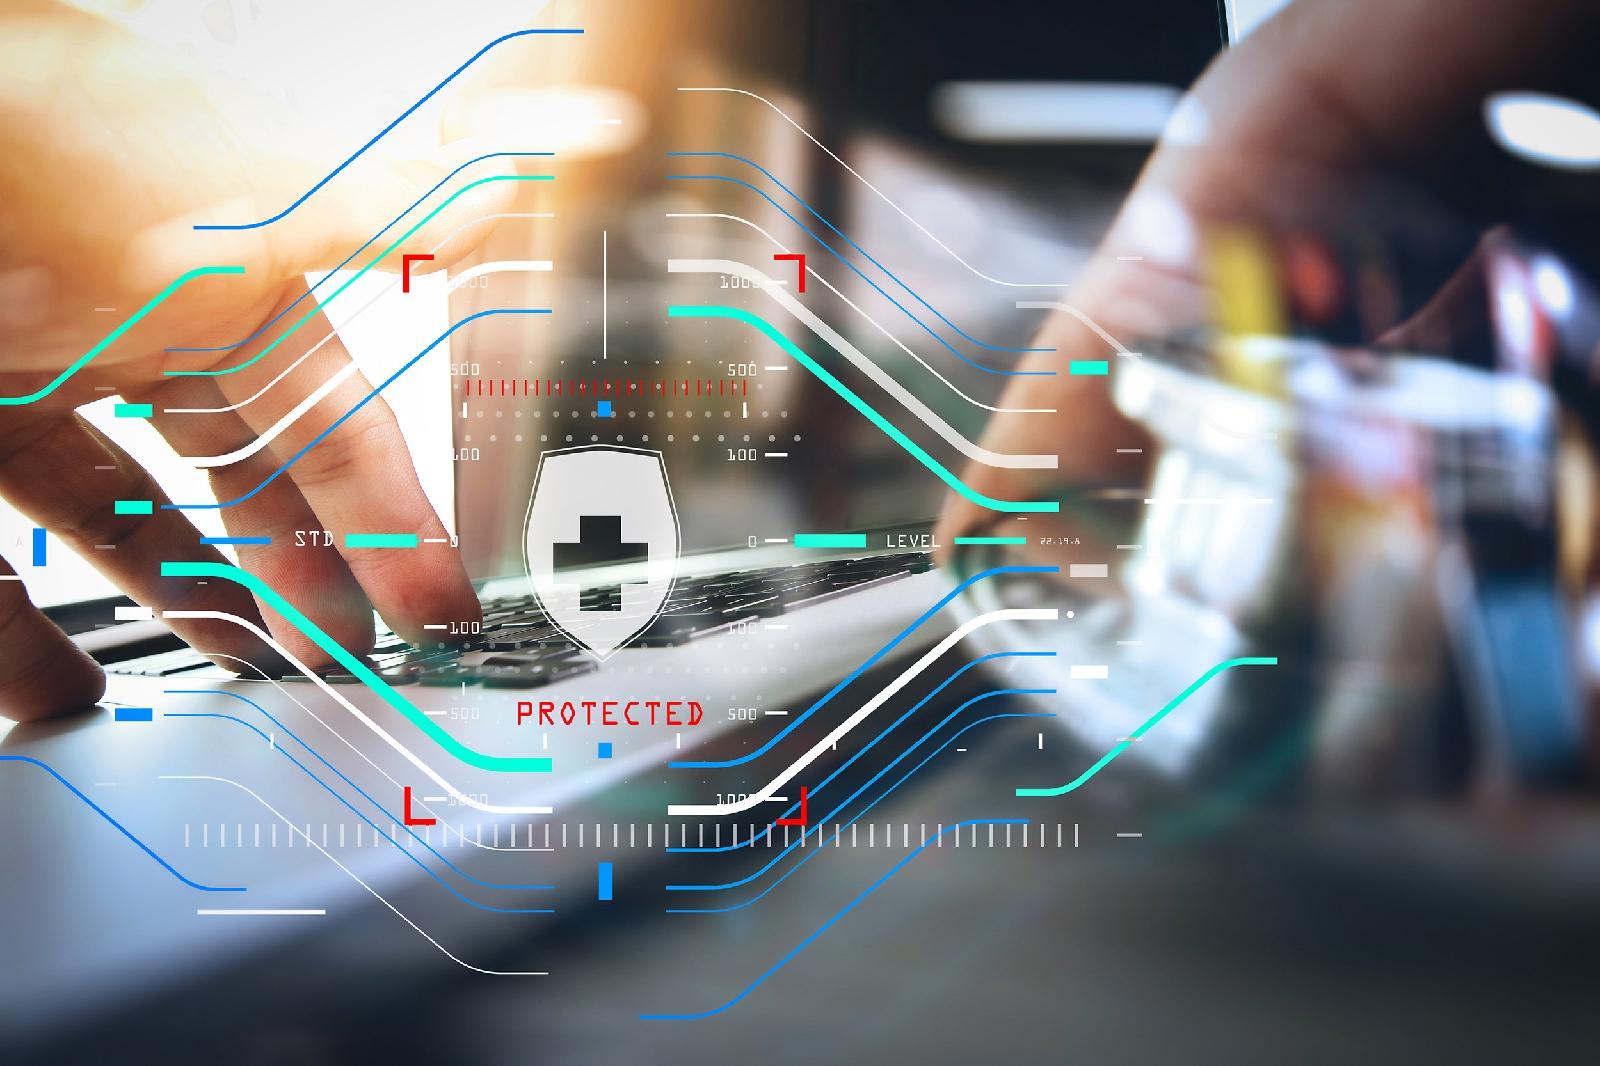 Forcepoint ชี้ Zero Trust ให้แนวทางรักษาความปลอดภัยได้ฉลาดมากขึ้น รองรับยุคแห่งการเฝ้าระวัง คนทำงานหลากหลายสถานที่ ต้องใช้หลายอุปกรณ์เข้าถึงเครือข่ายและข้อมูลจากระยะไกล